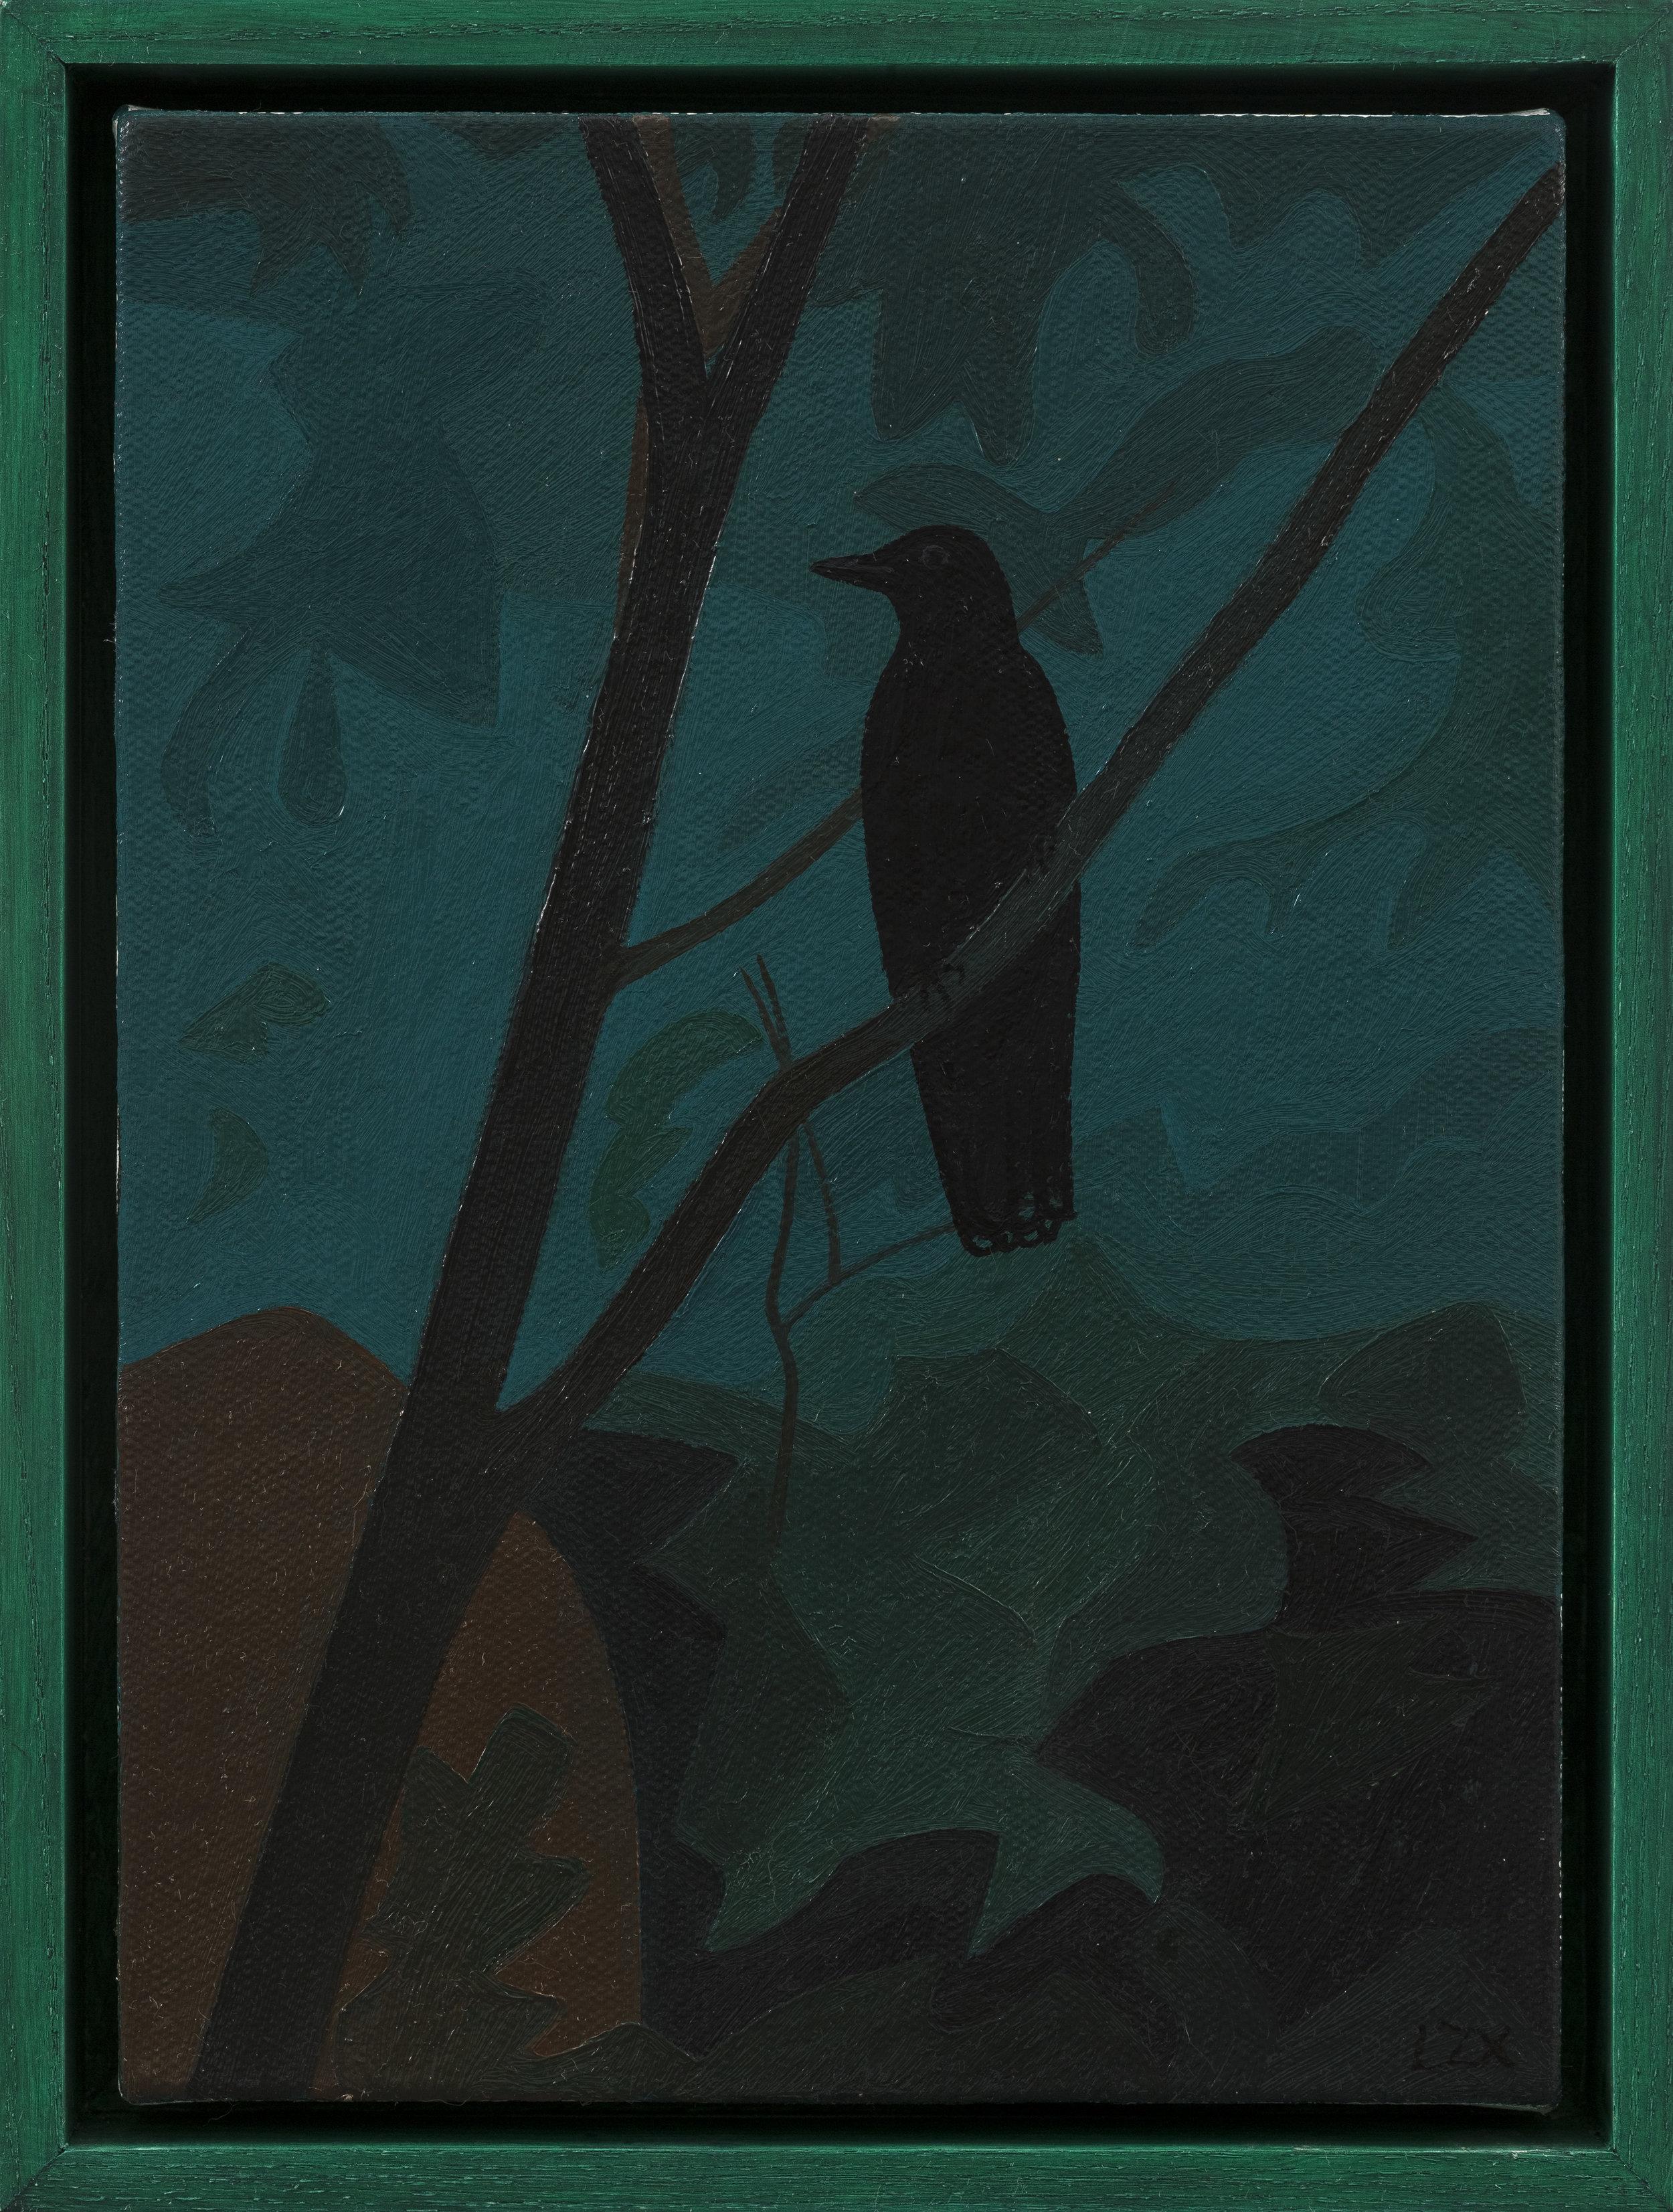 Lan Zhaoxing,  A Bird , 2018. Oil on canvas, 11.8 x 8.6 inch © Lan Zhaoxing, courtesy Fou Gallery